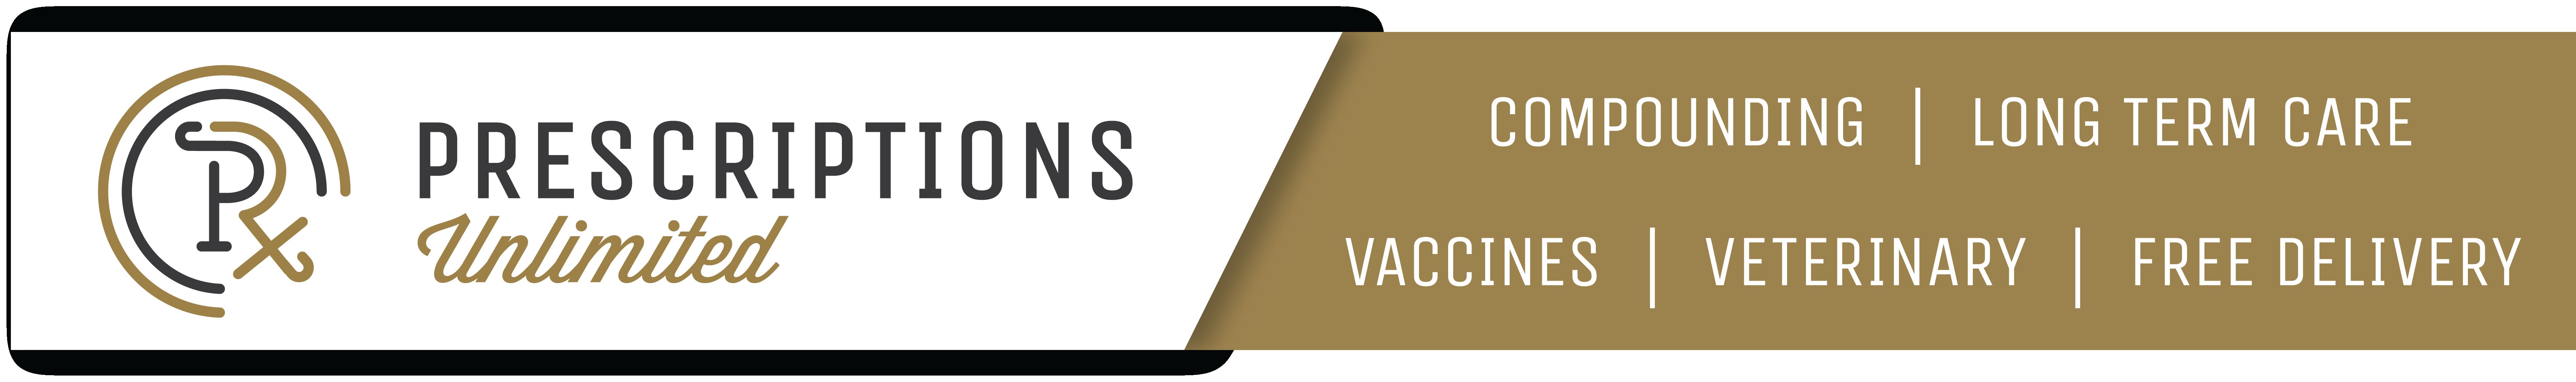 Prescriptions Unlimited Web Banner